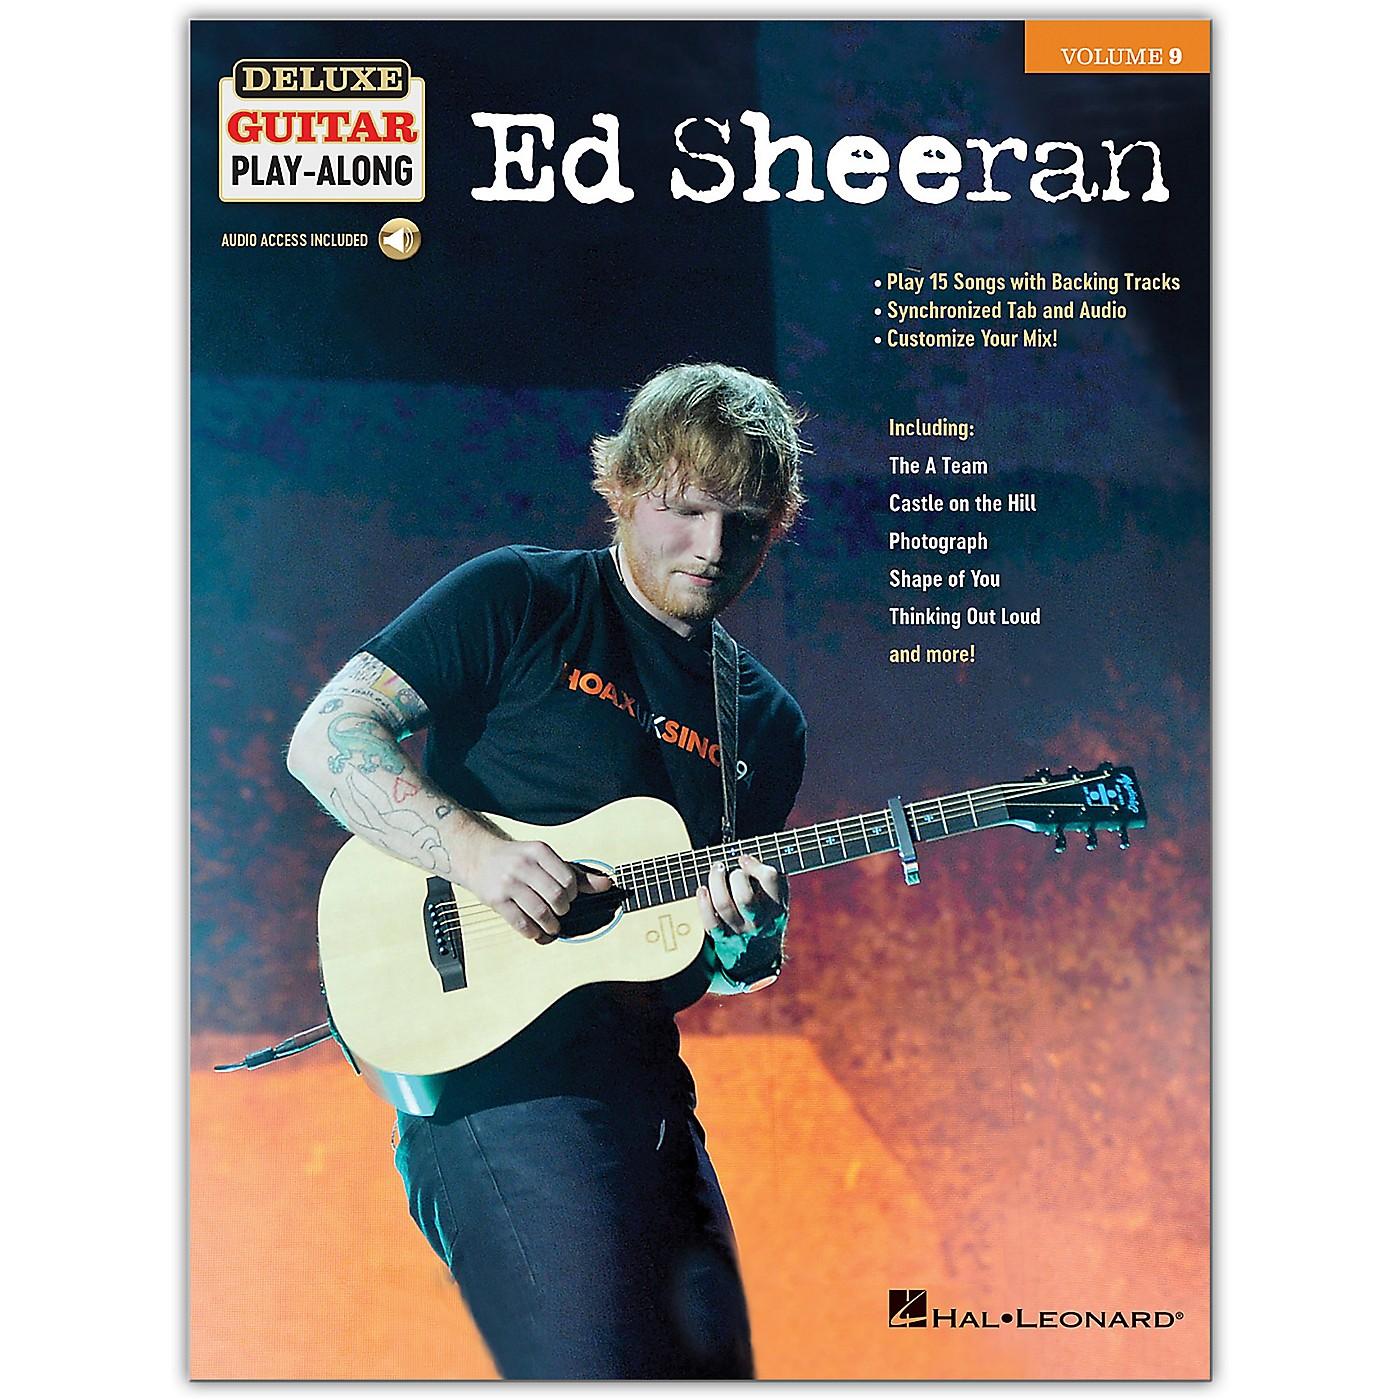 Hal Leonard Ed Sheeran Deluxe Guitar Play-Along Volume 9 Book/Audio Online thumbnail